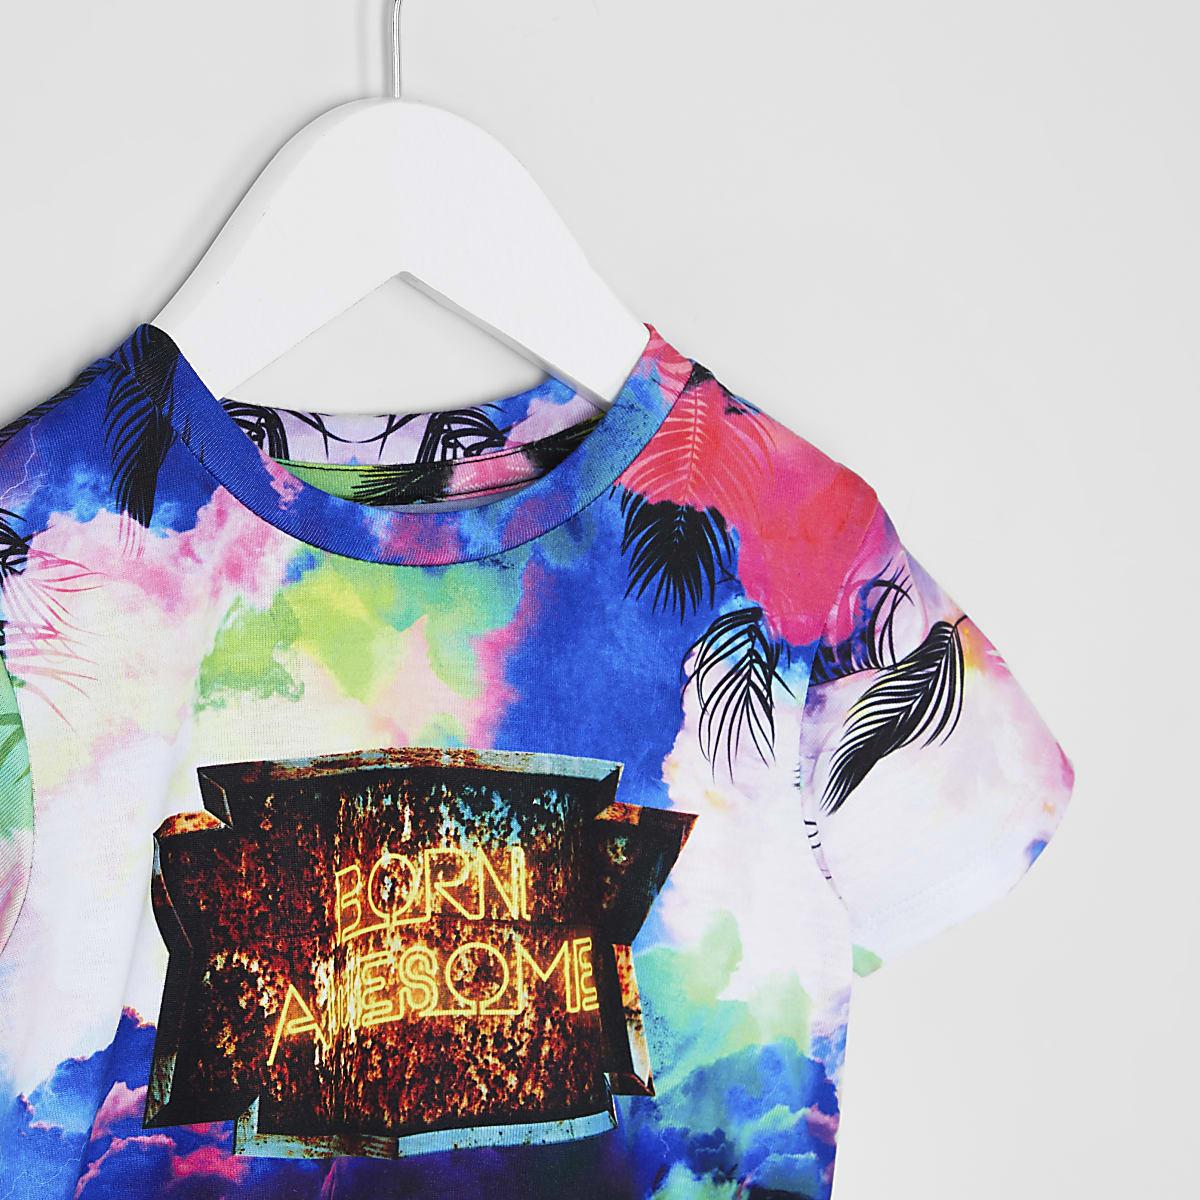 8f65a193 Mini boys 'born awesome' storm print T-shirt - Baby Boys Tops - Mini ...